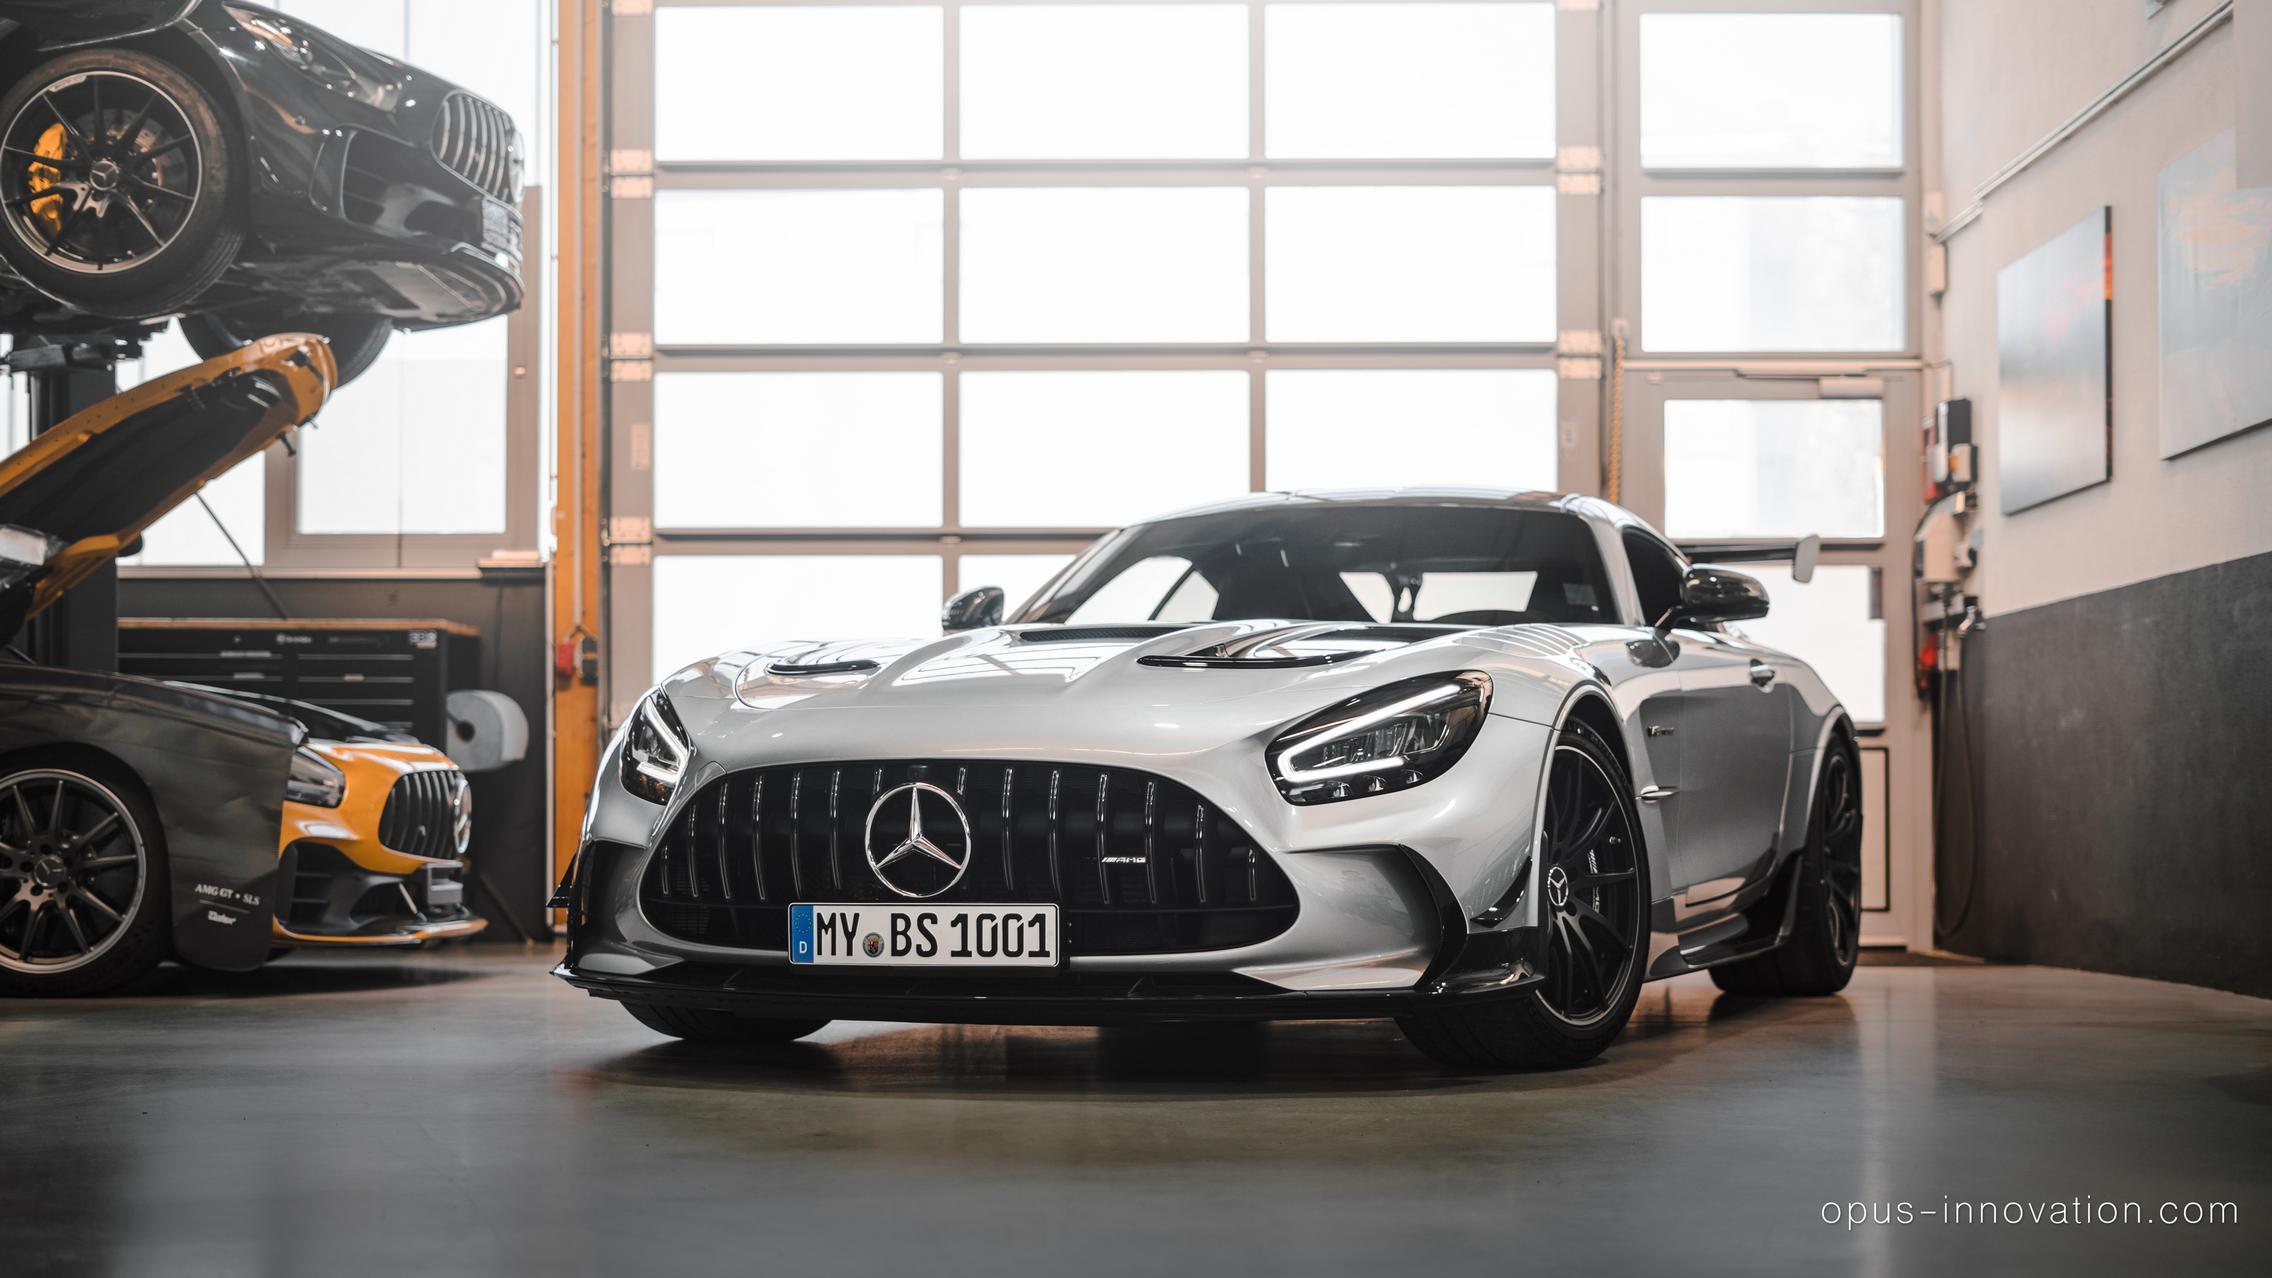 Freshly Delivered Mercedes-AMG GT Black Series Has 1,111hp after Tuning - GTspirit